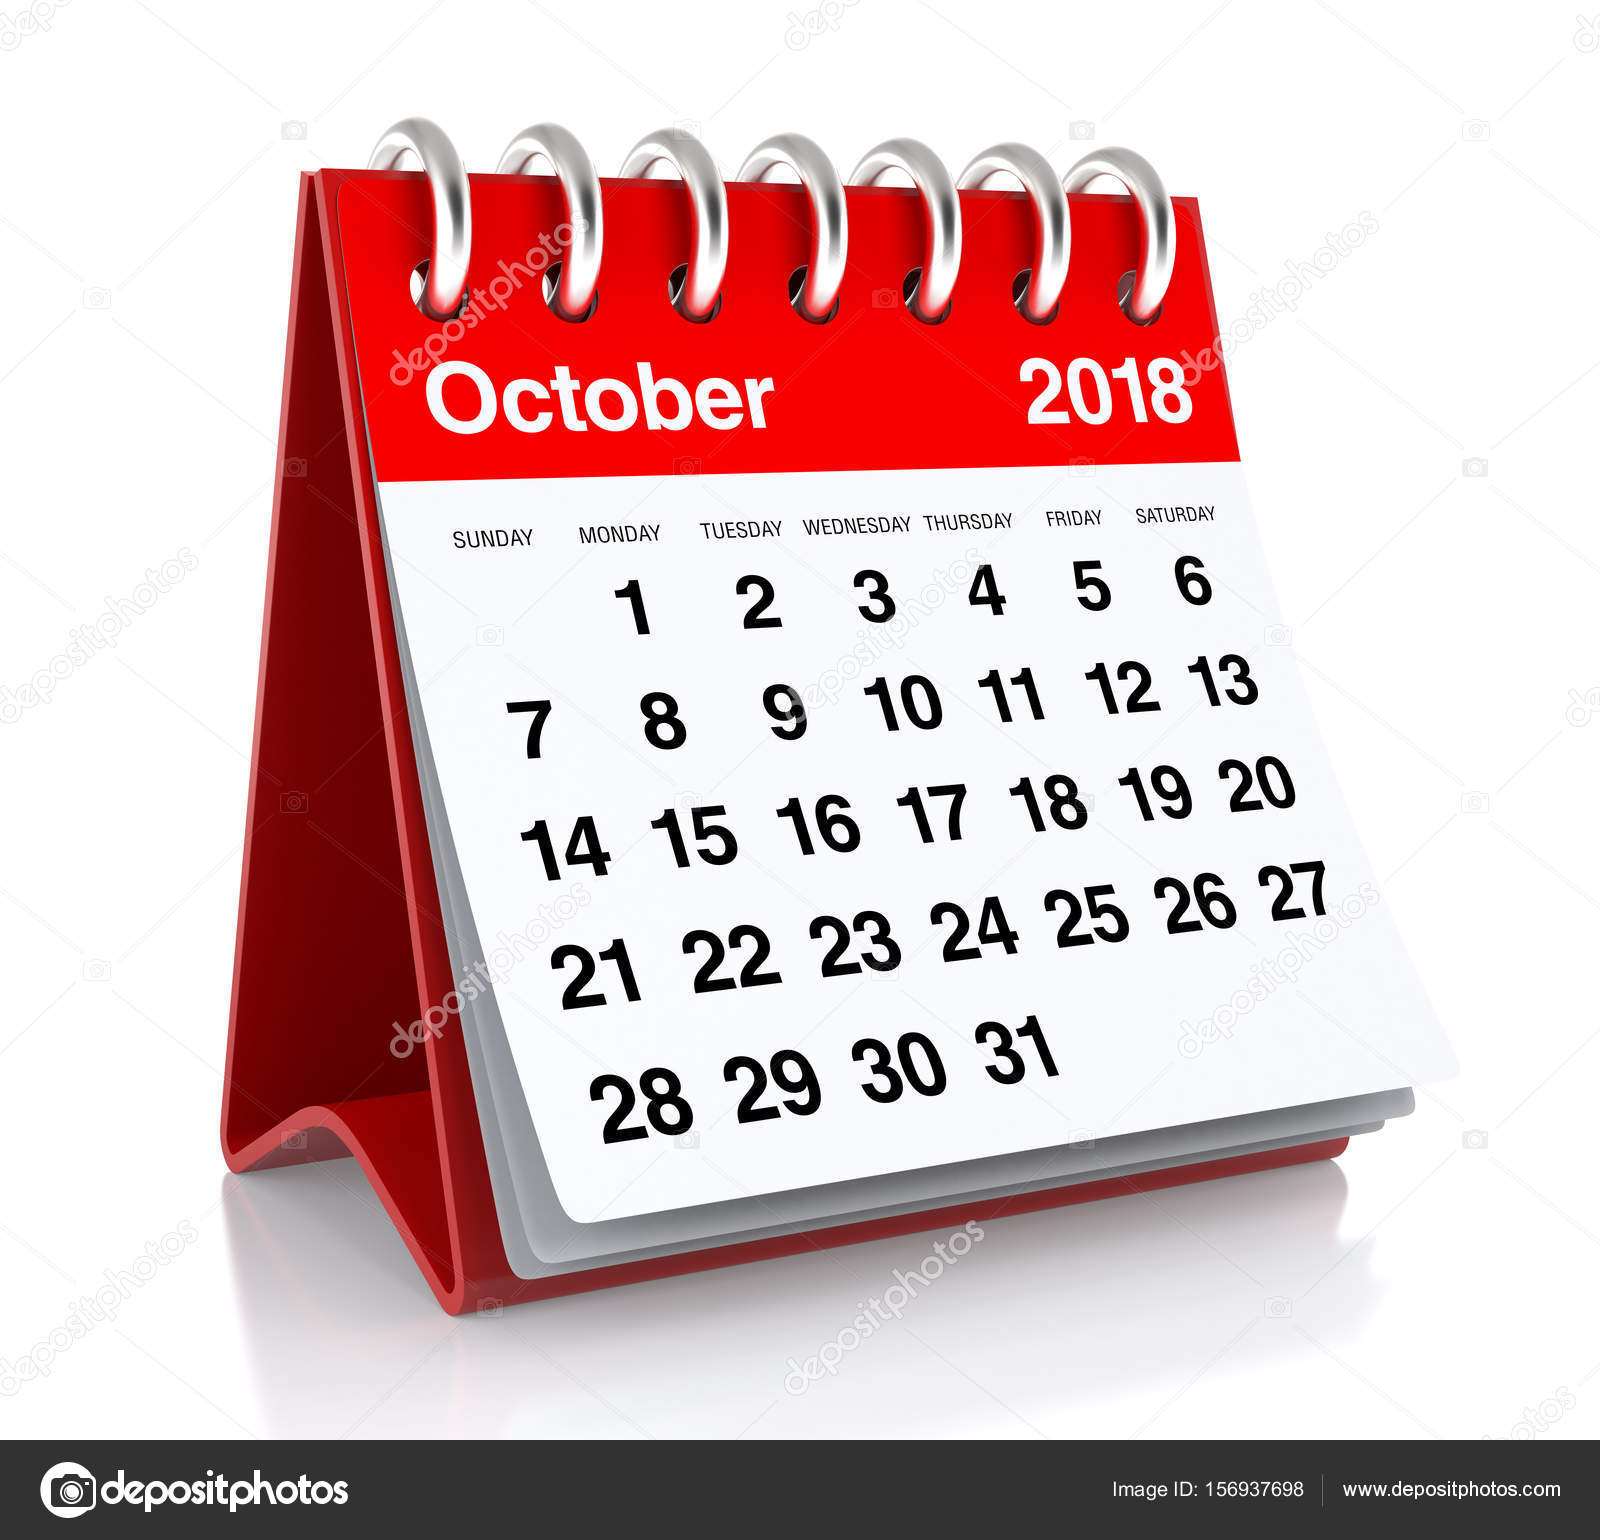 October 2018 Calendar — Stock Photo © klenger #156937698